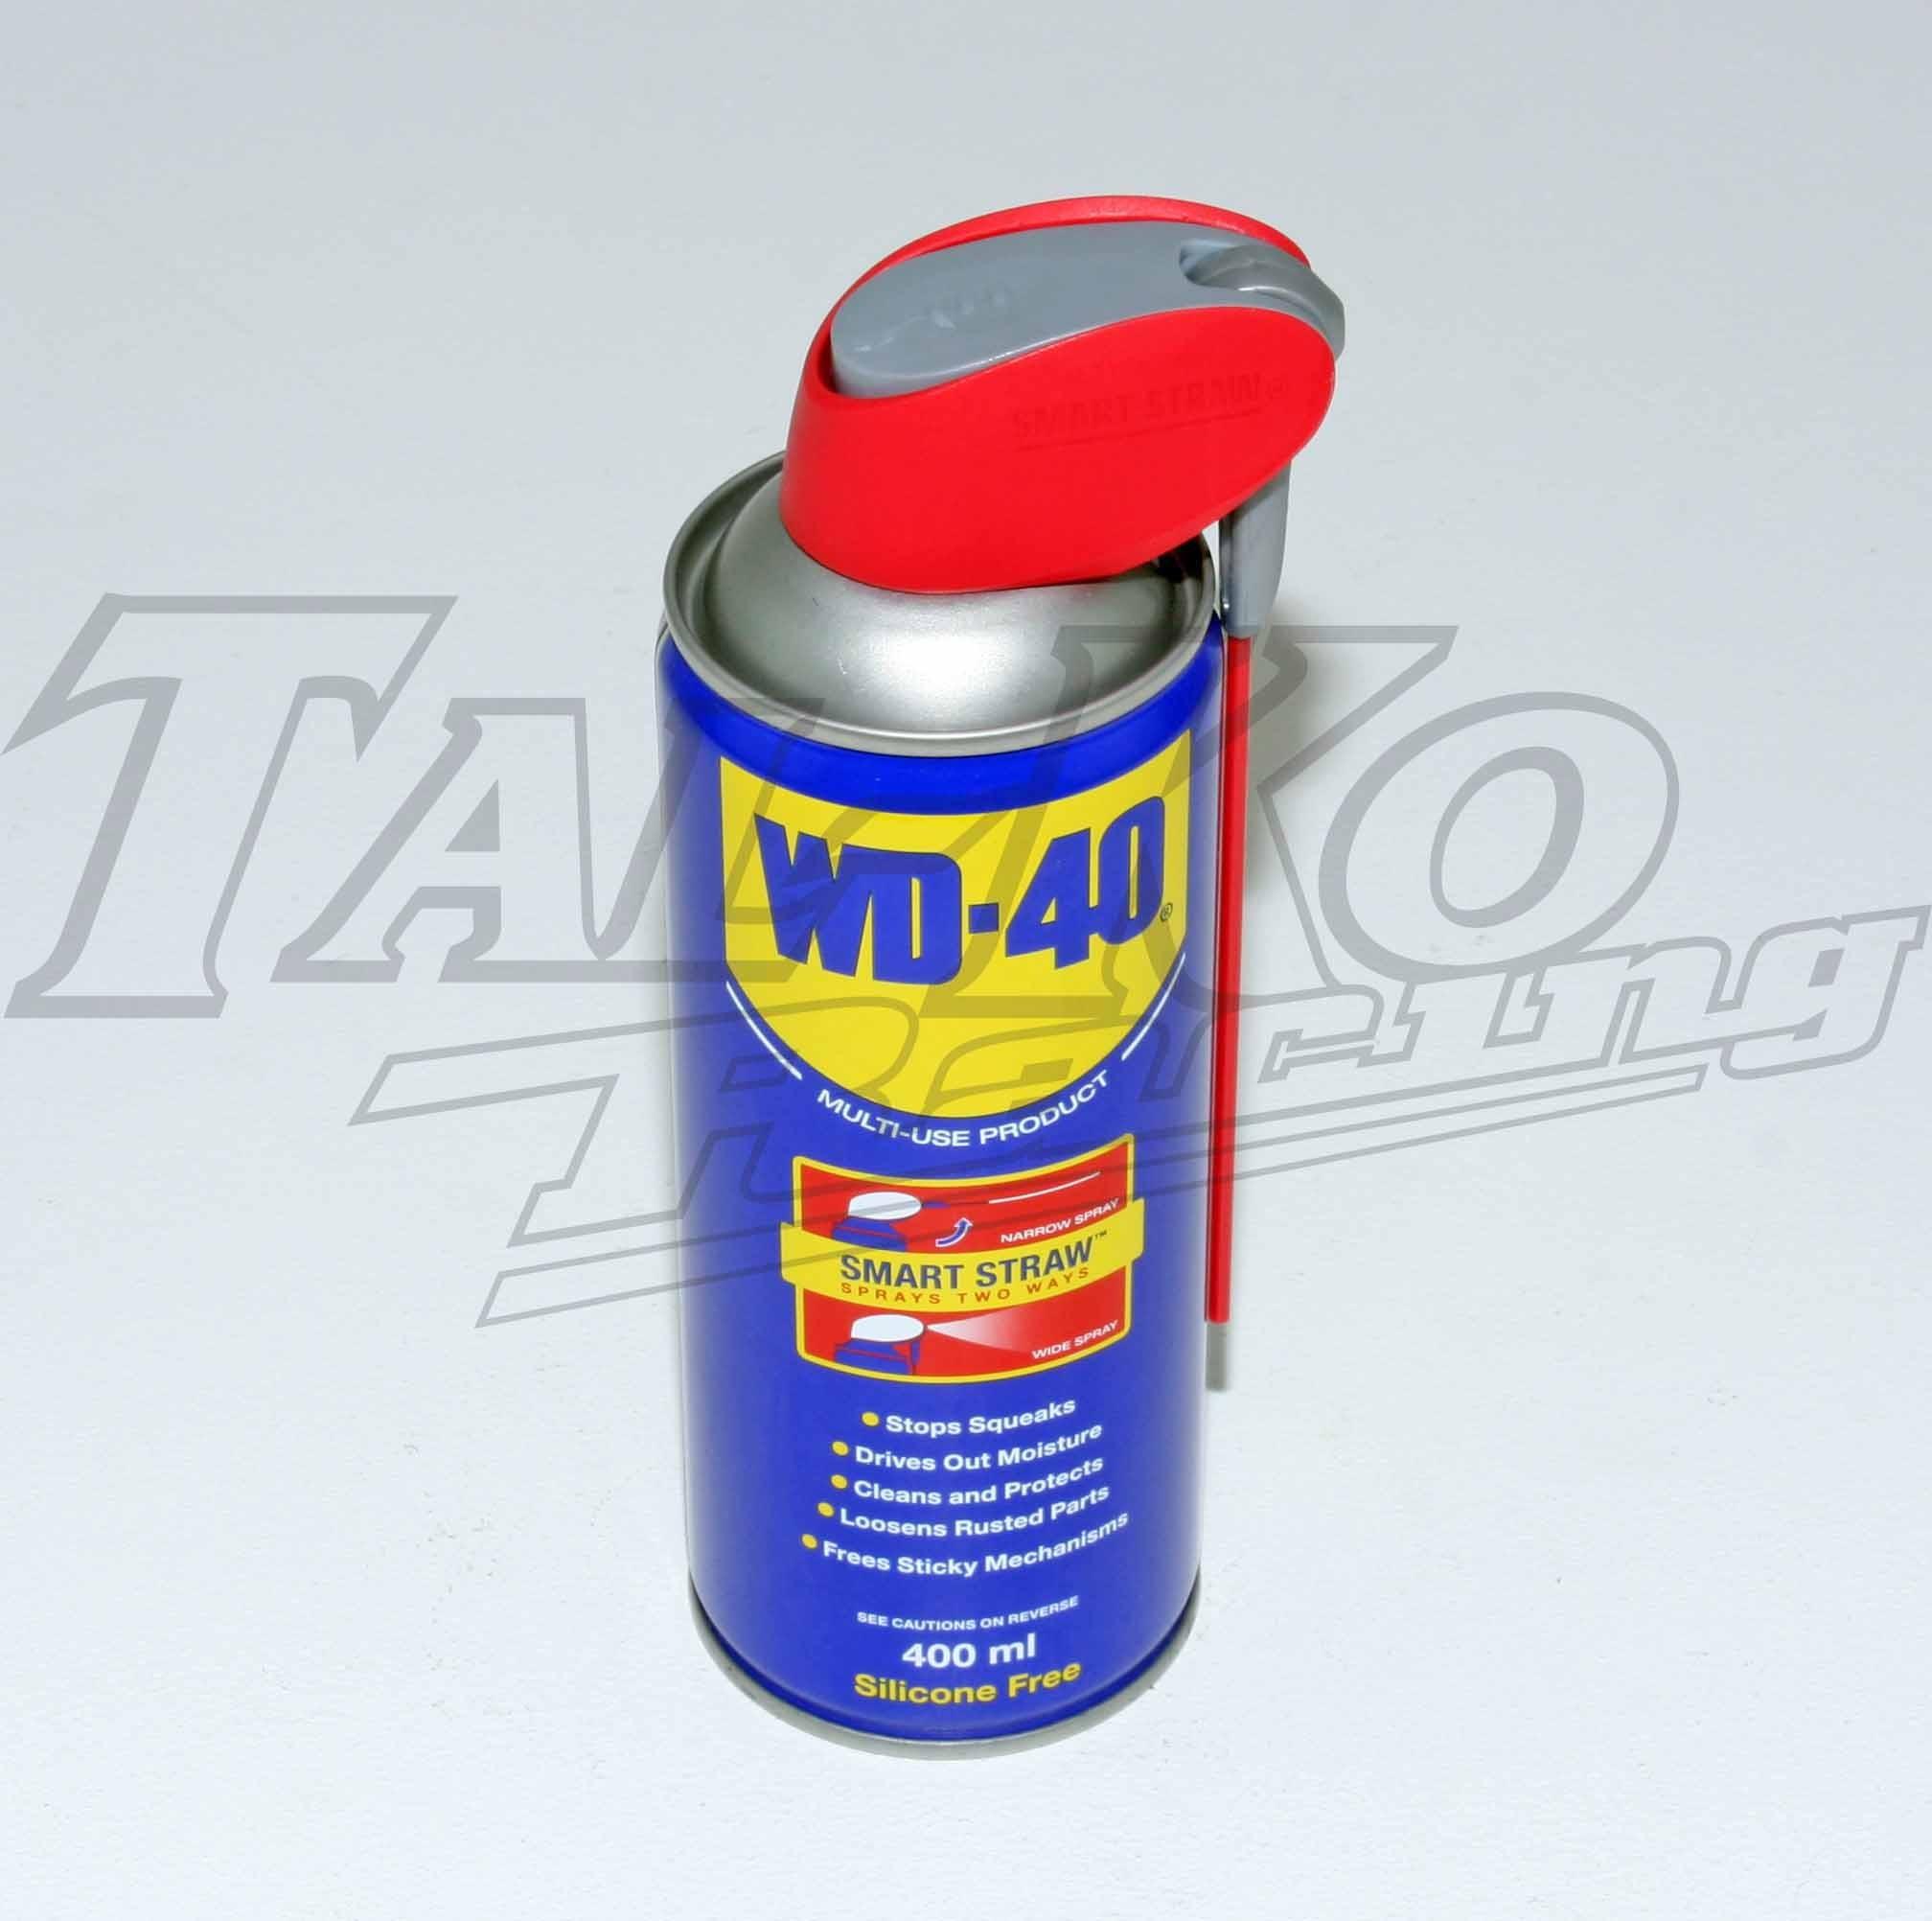 WD40 MULTI-USE SMART STRAW SPRAY 400ml